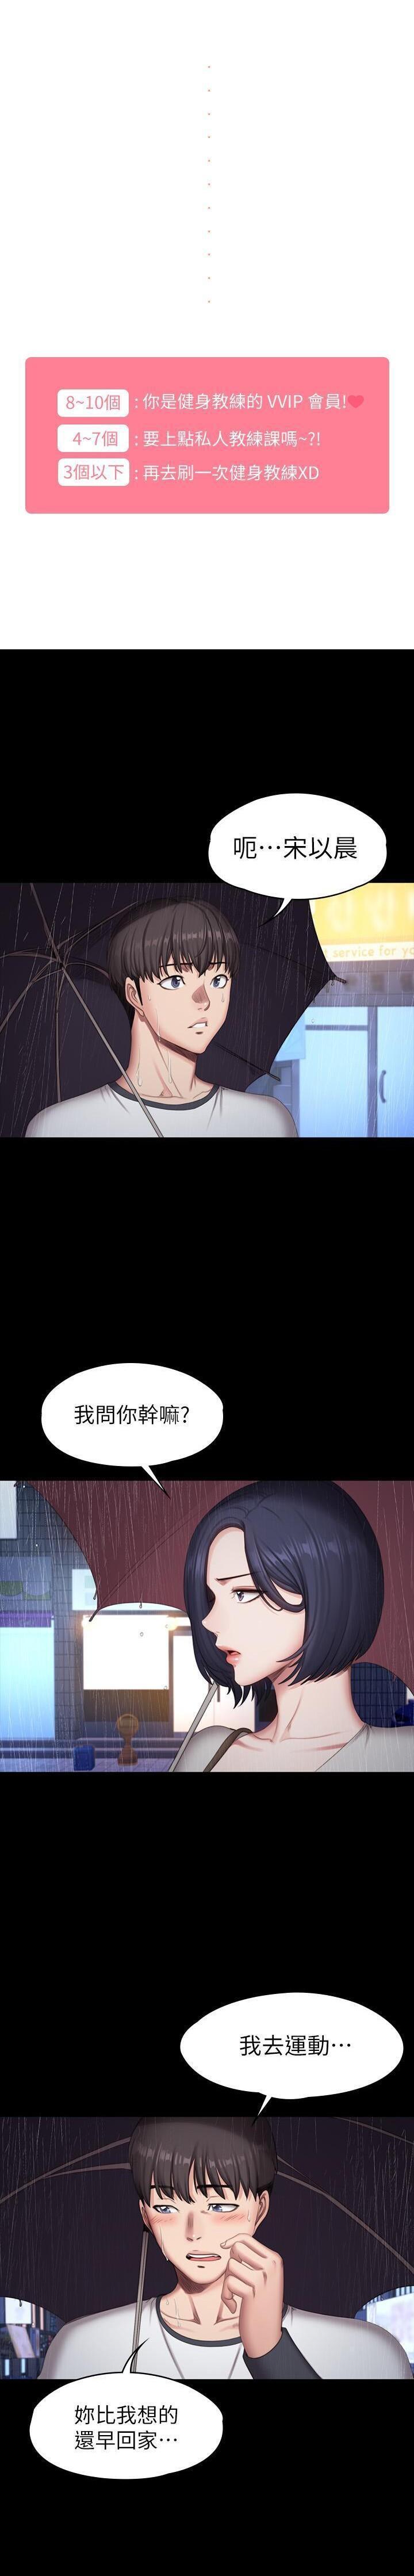 FITNESS 61-88 CHI 409